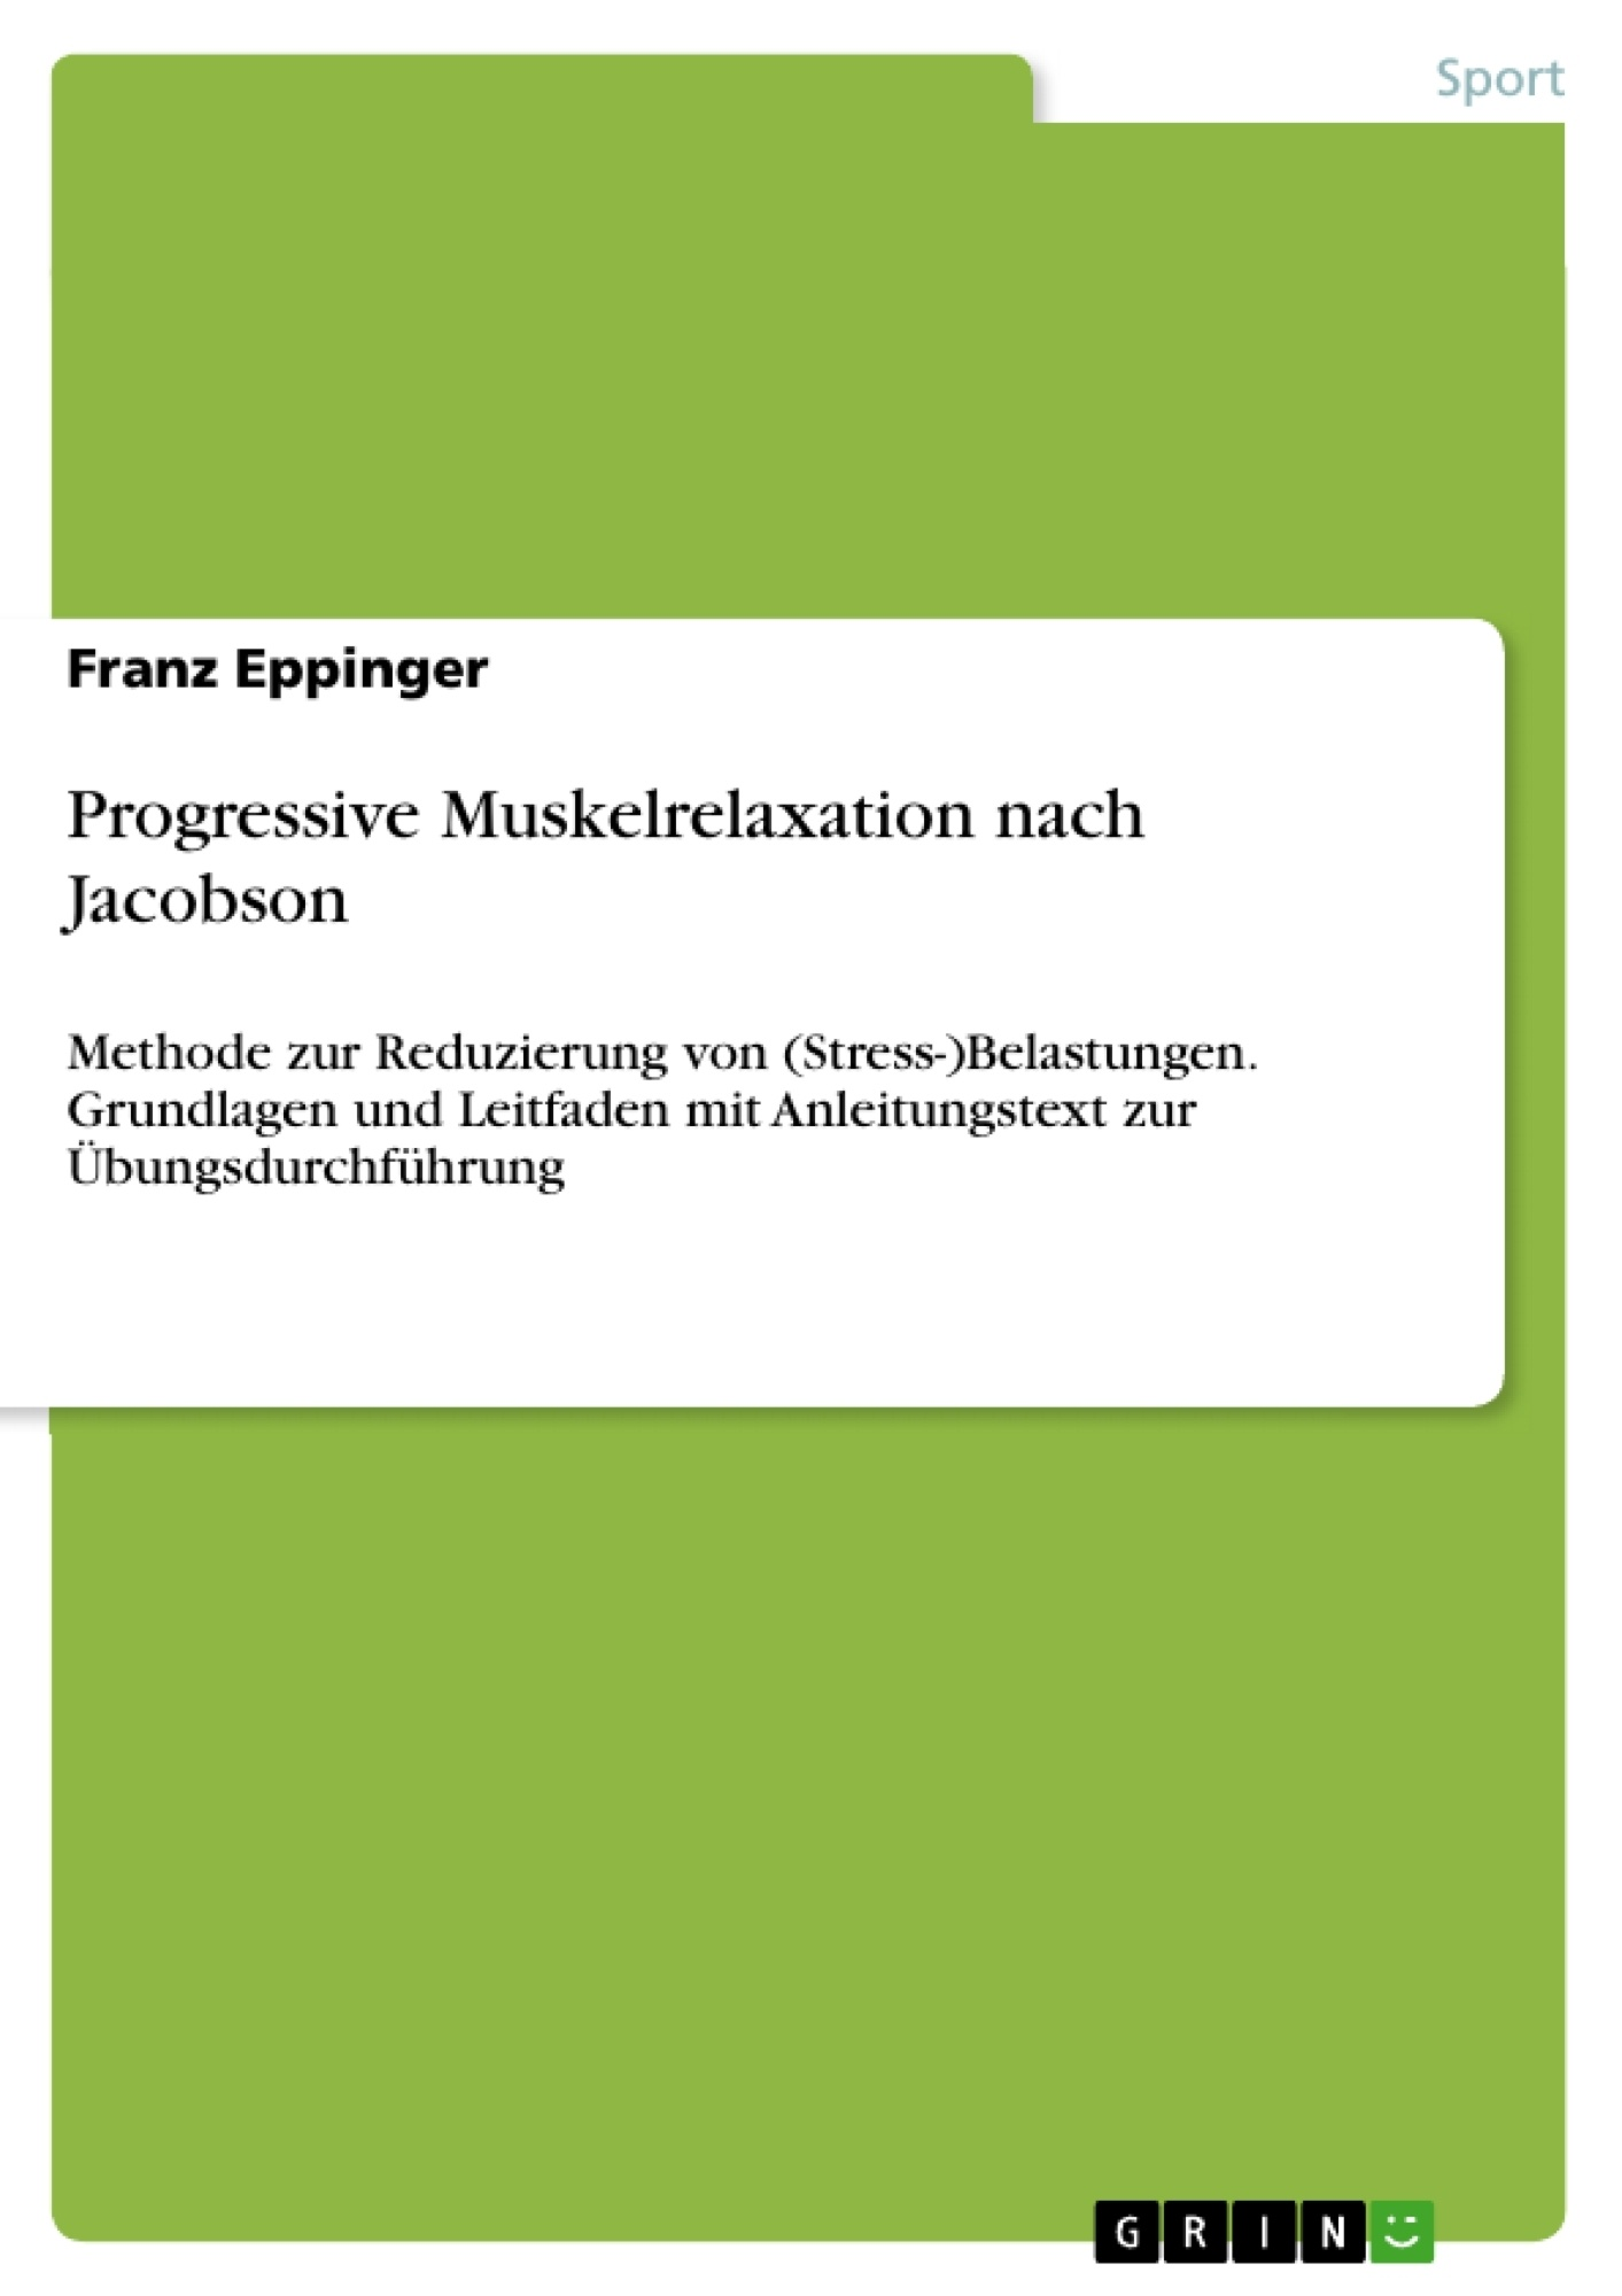 Titel: Progressive Muskelrelaxation nach Jacobson